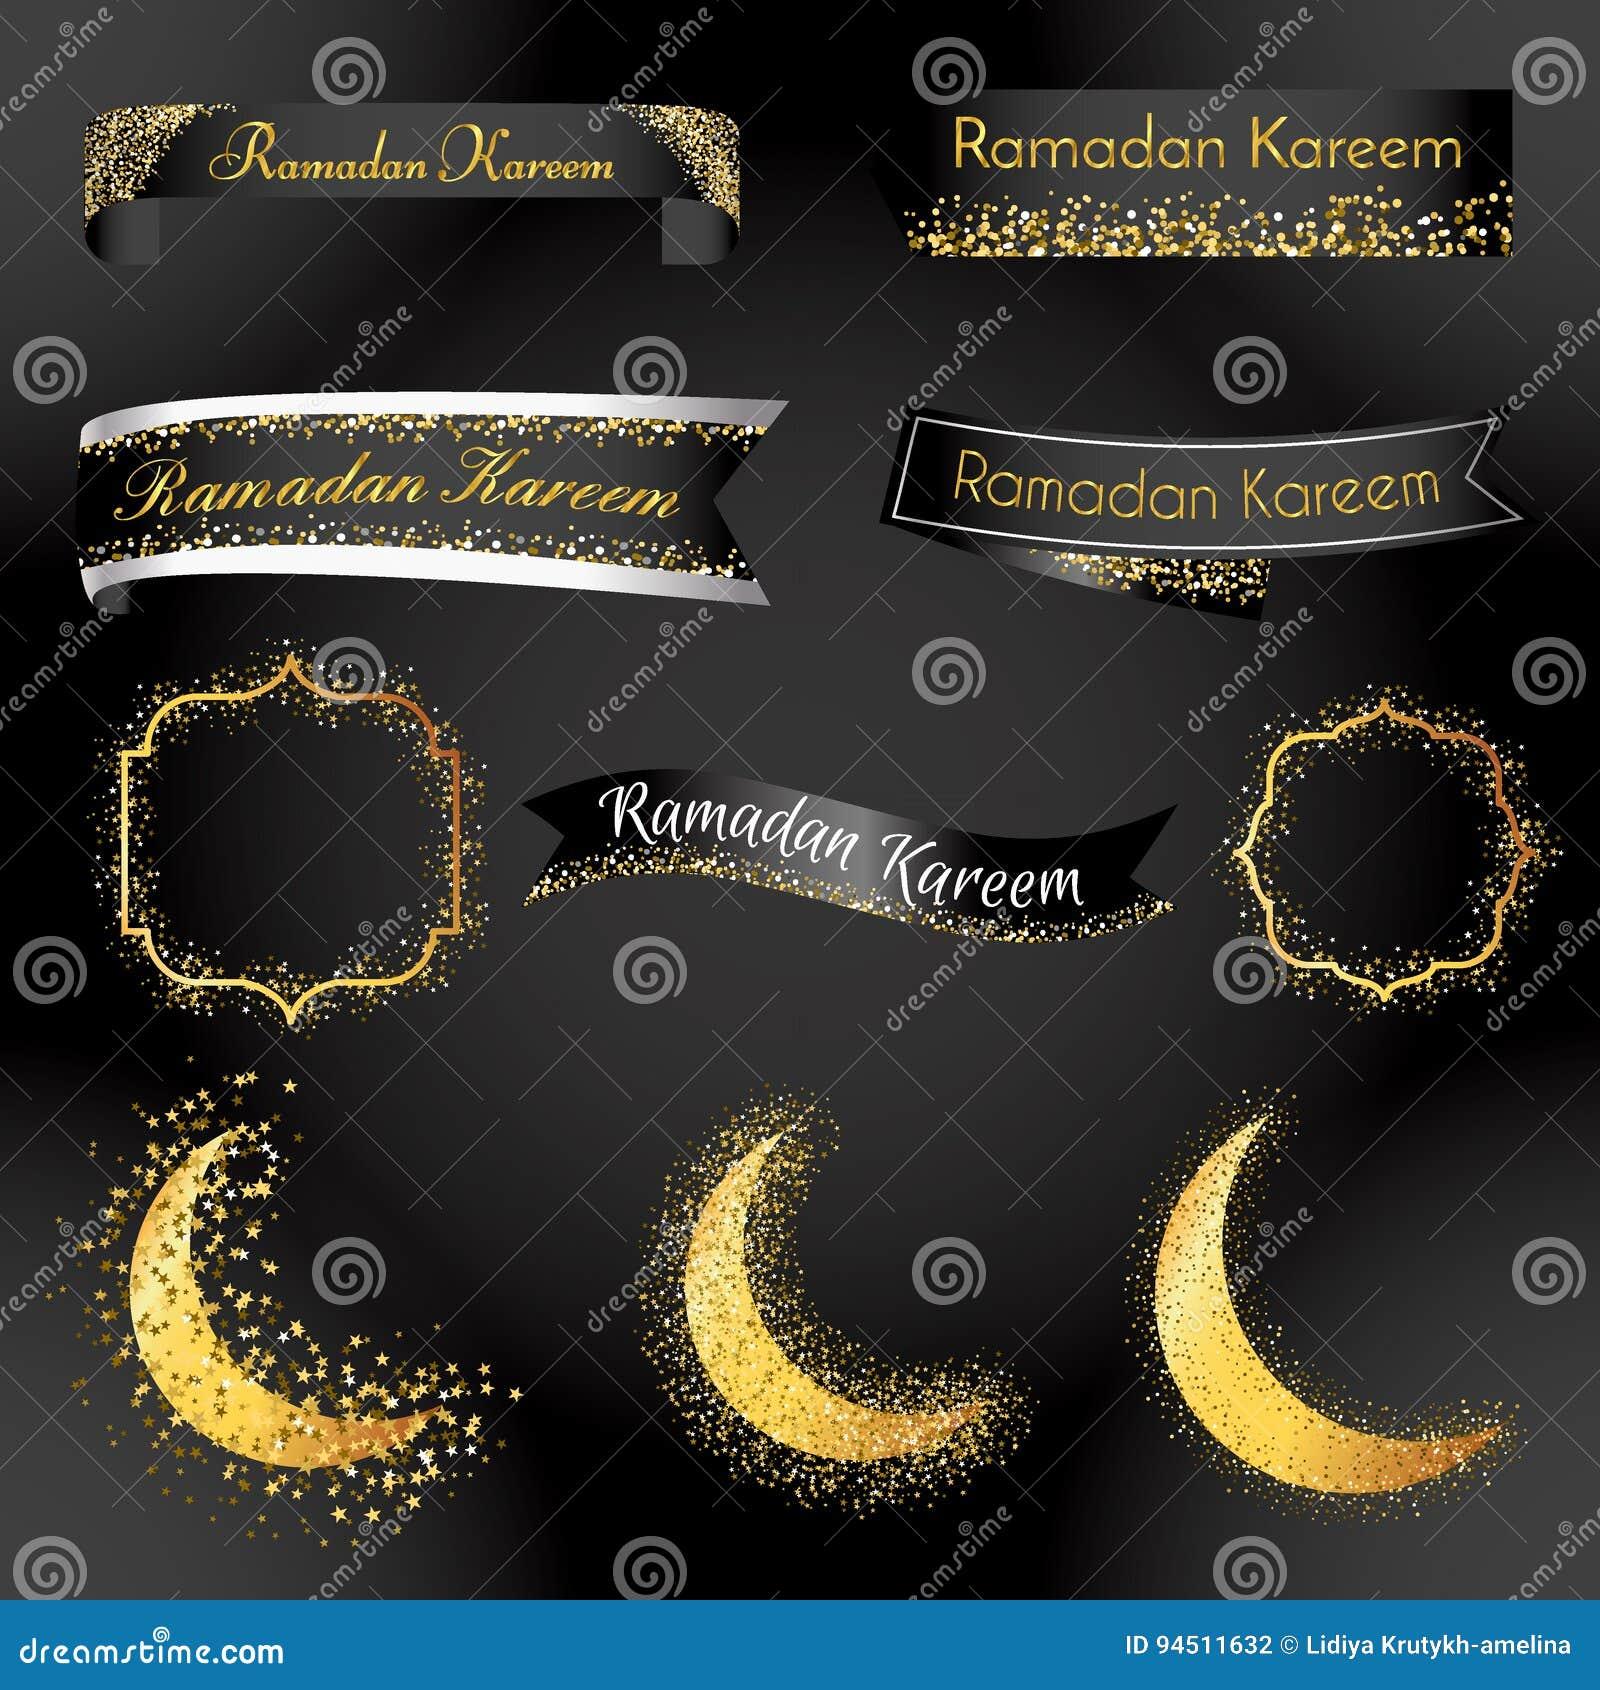 Ramadan Kareem Ribbon And Label Template. Vector Object Badge For ...